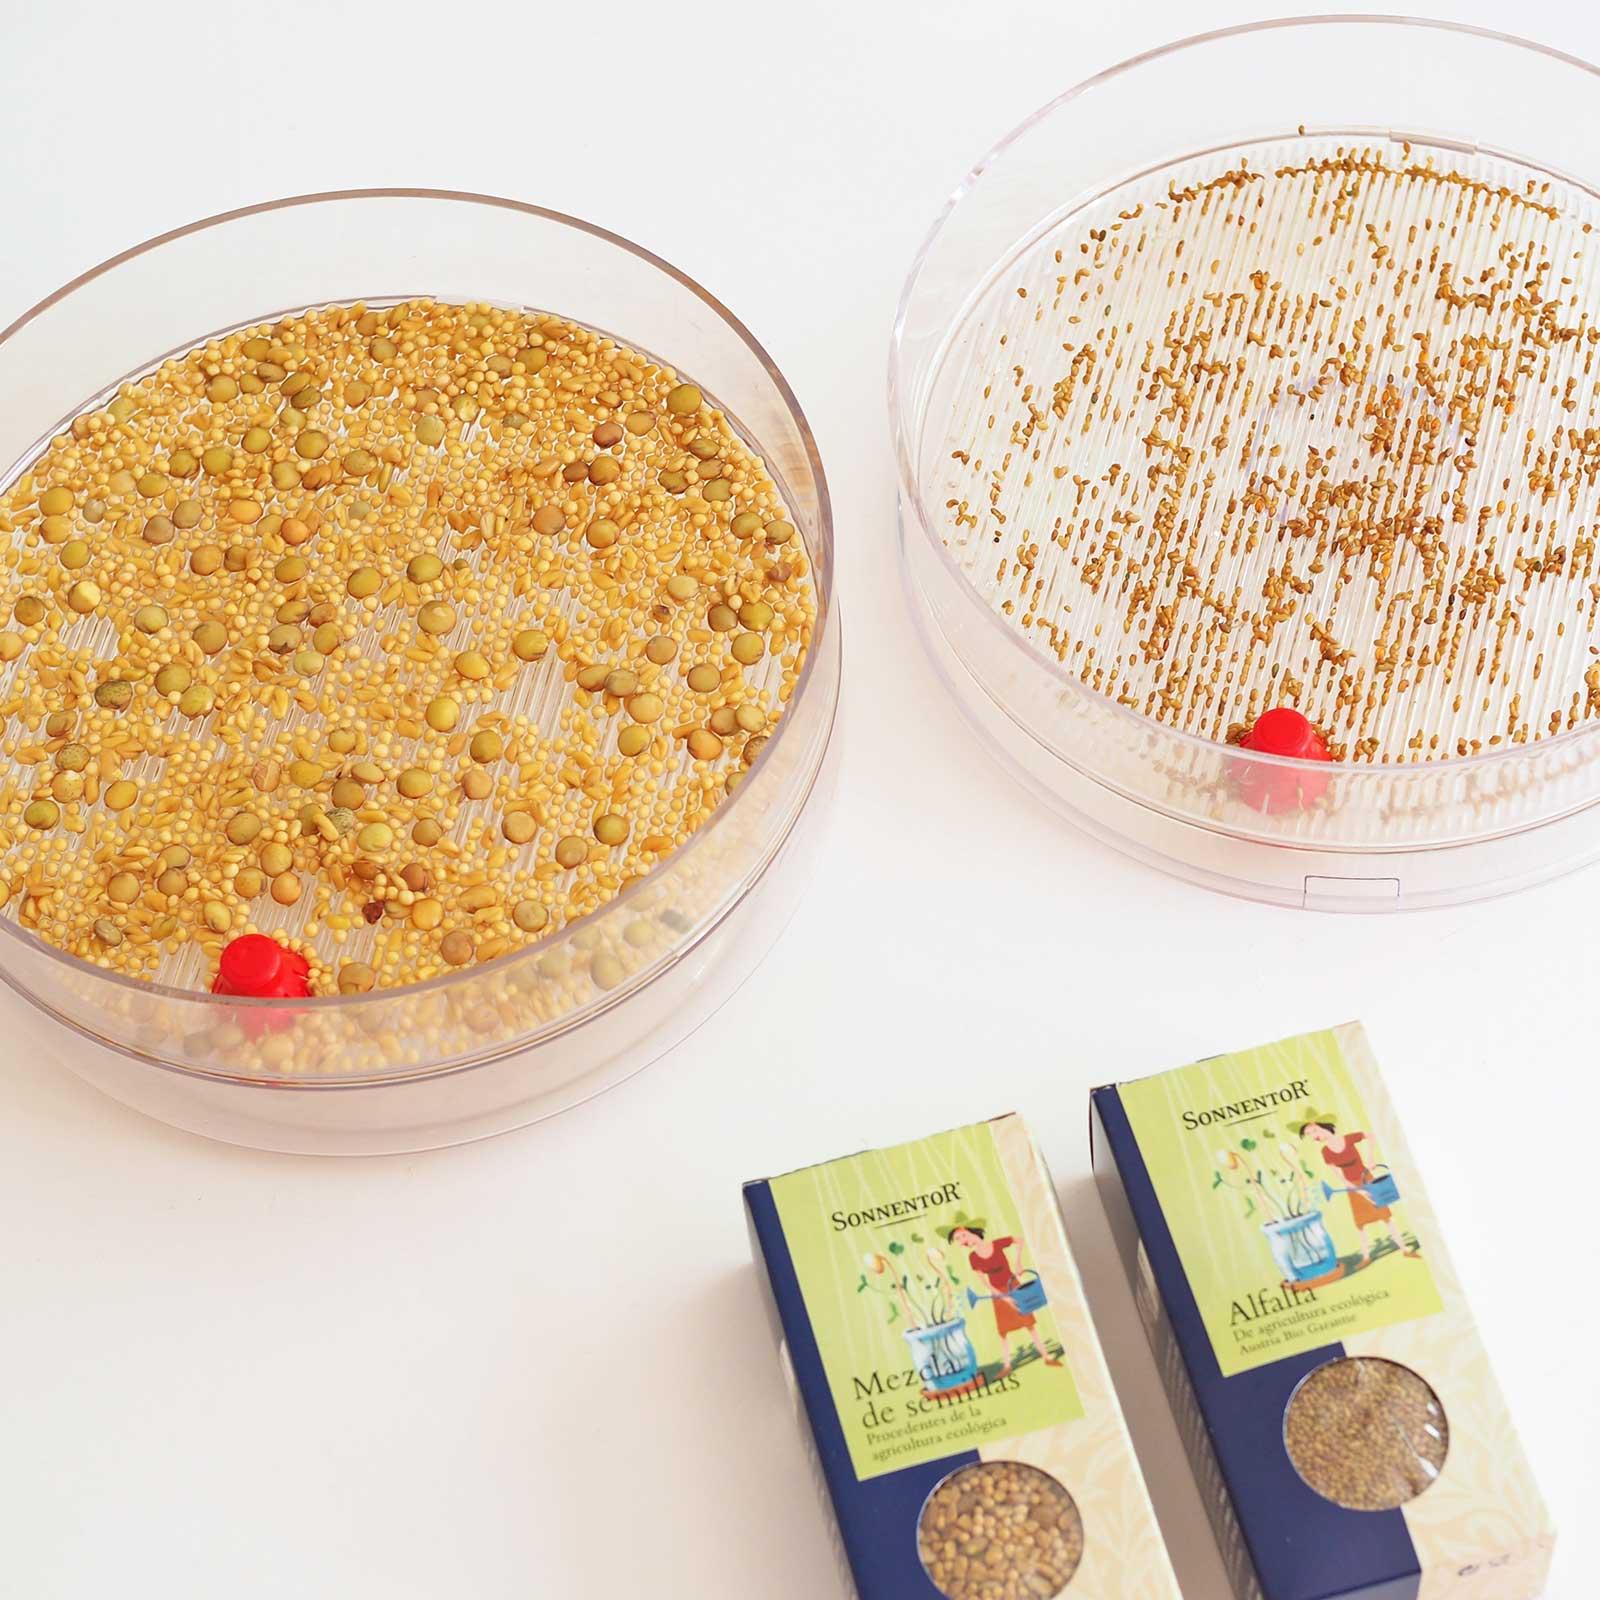 germoir A.Vogel semis graines bio moutarde lentilles fenugrec alfalfa Sonnentor